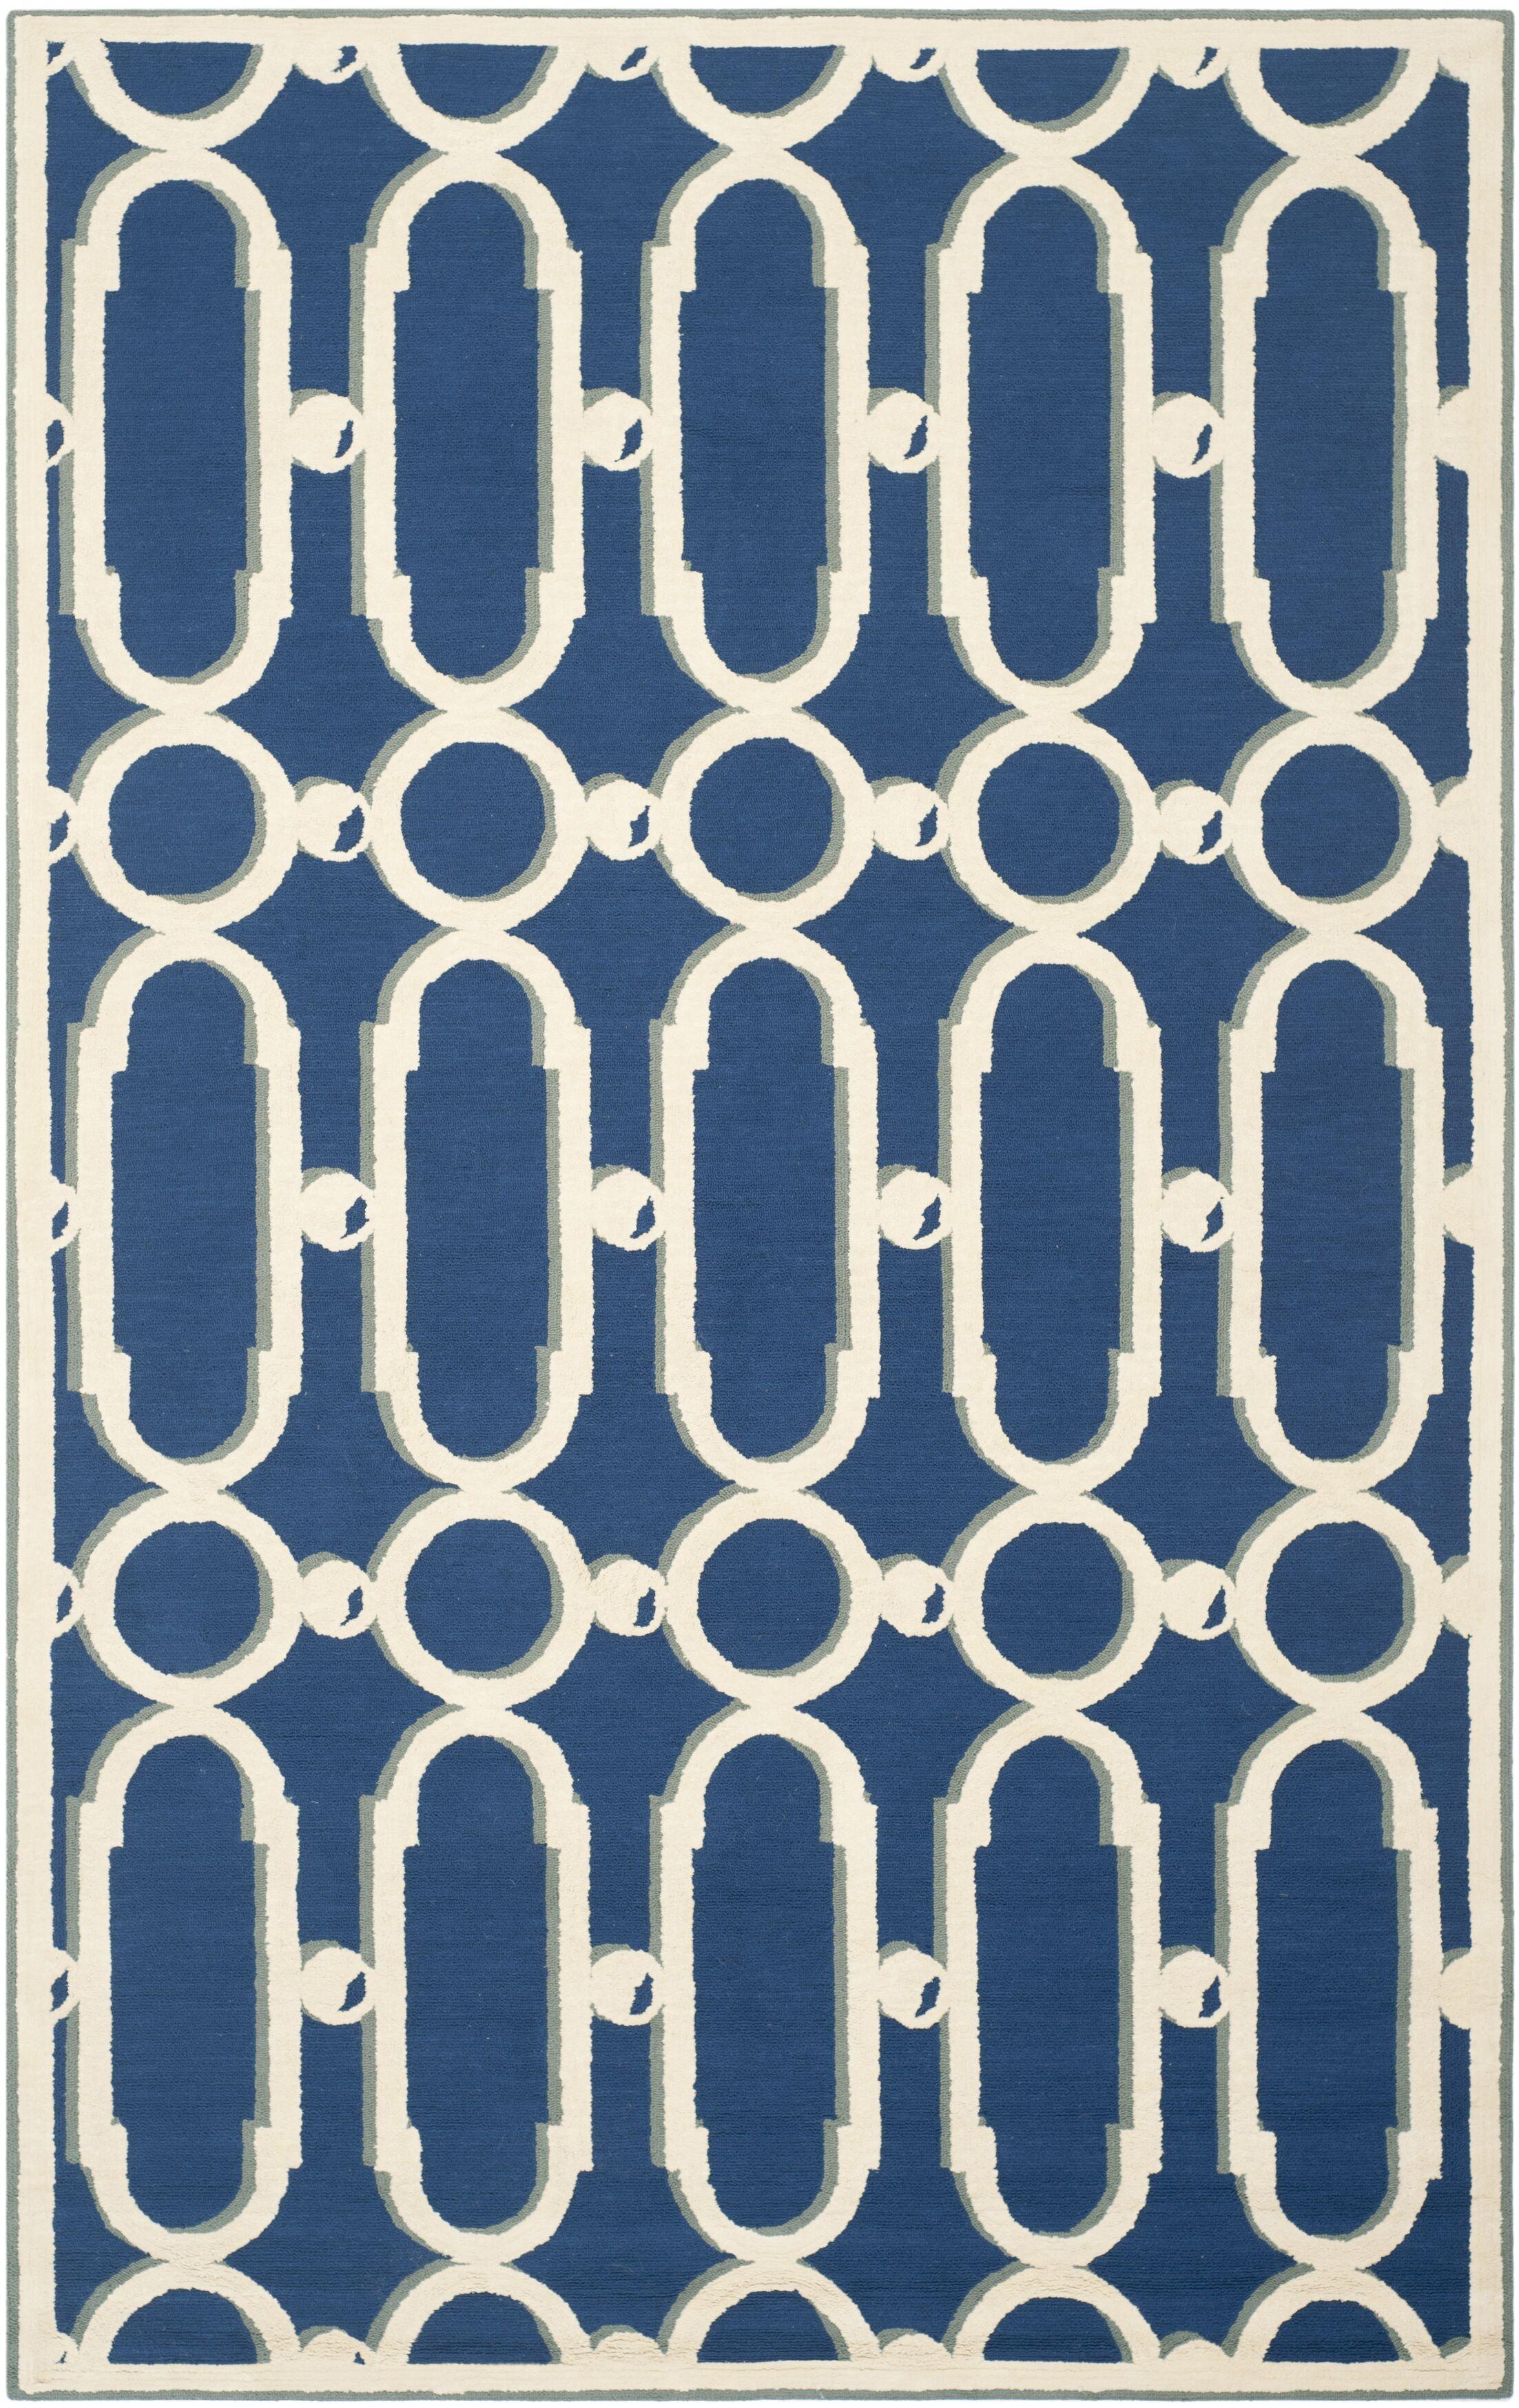 Sheeran Royal Blue/White Geometric Area Rug Rug Size: Rectangle 5'6